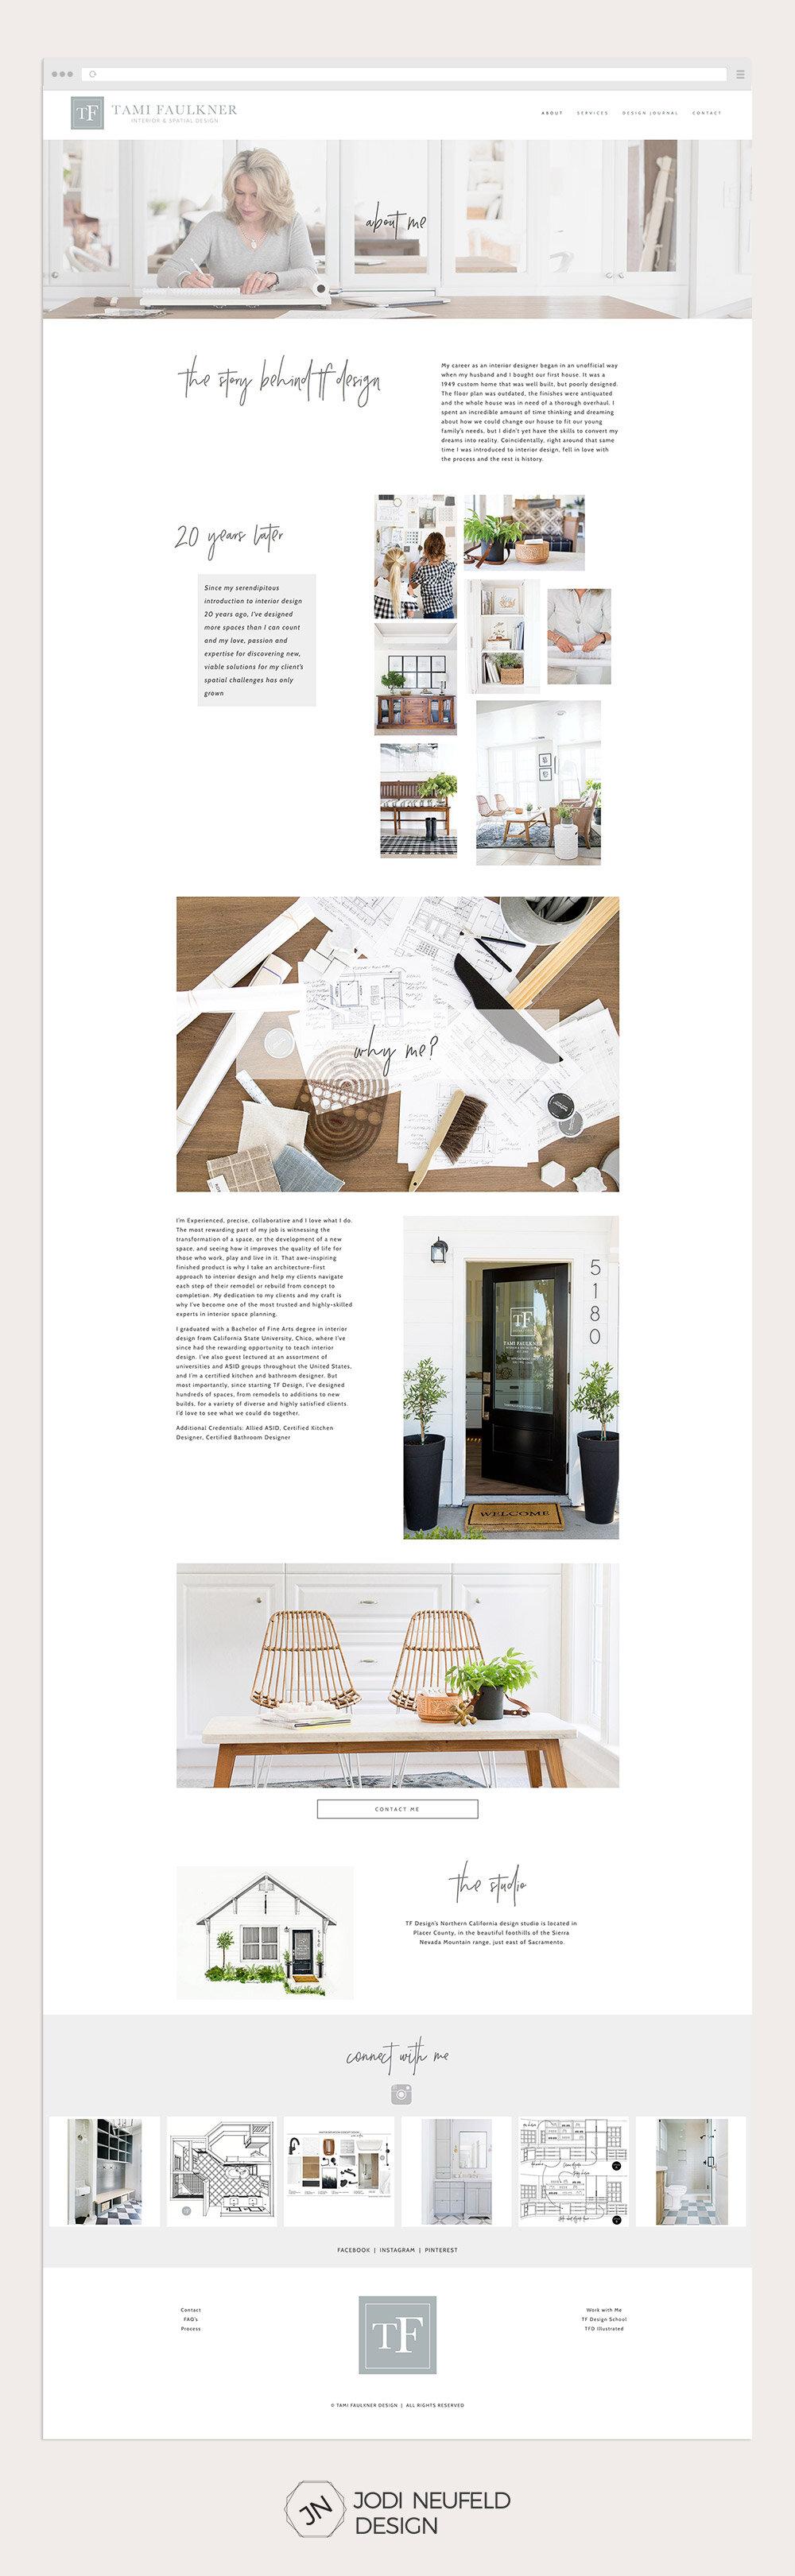 Tami Faulkner interior designer About page | #webdesign by Jodi Neufeld Design #interiordesign #squarespace